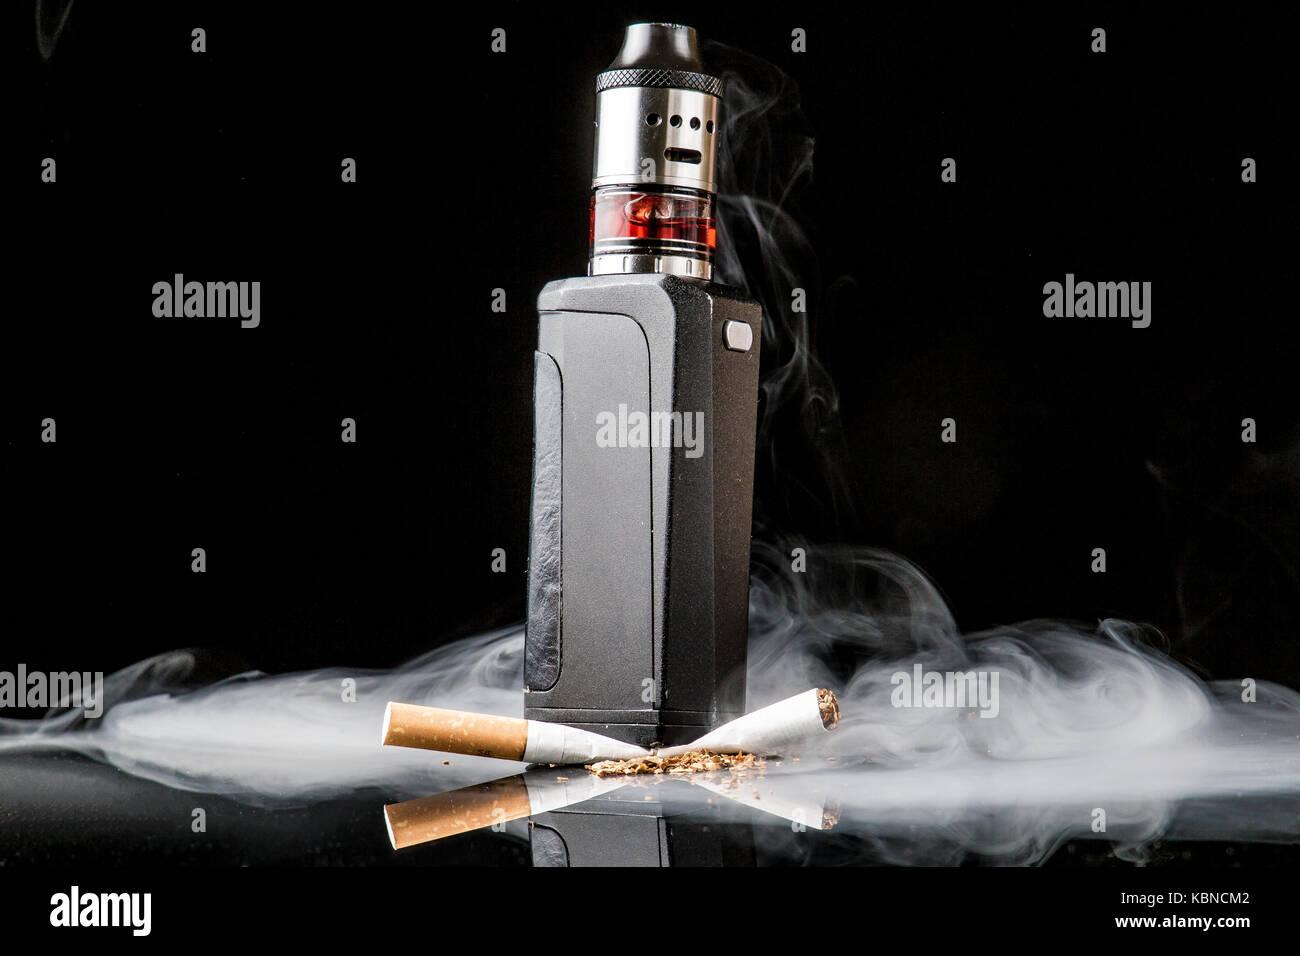 Modern vaporiser versus old tobacco cigarette Stock Photo